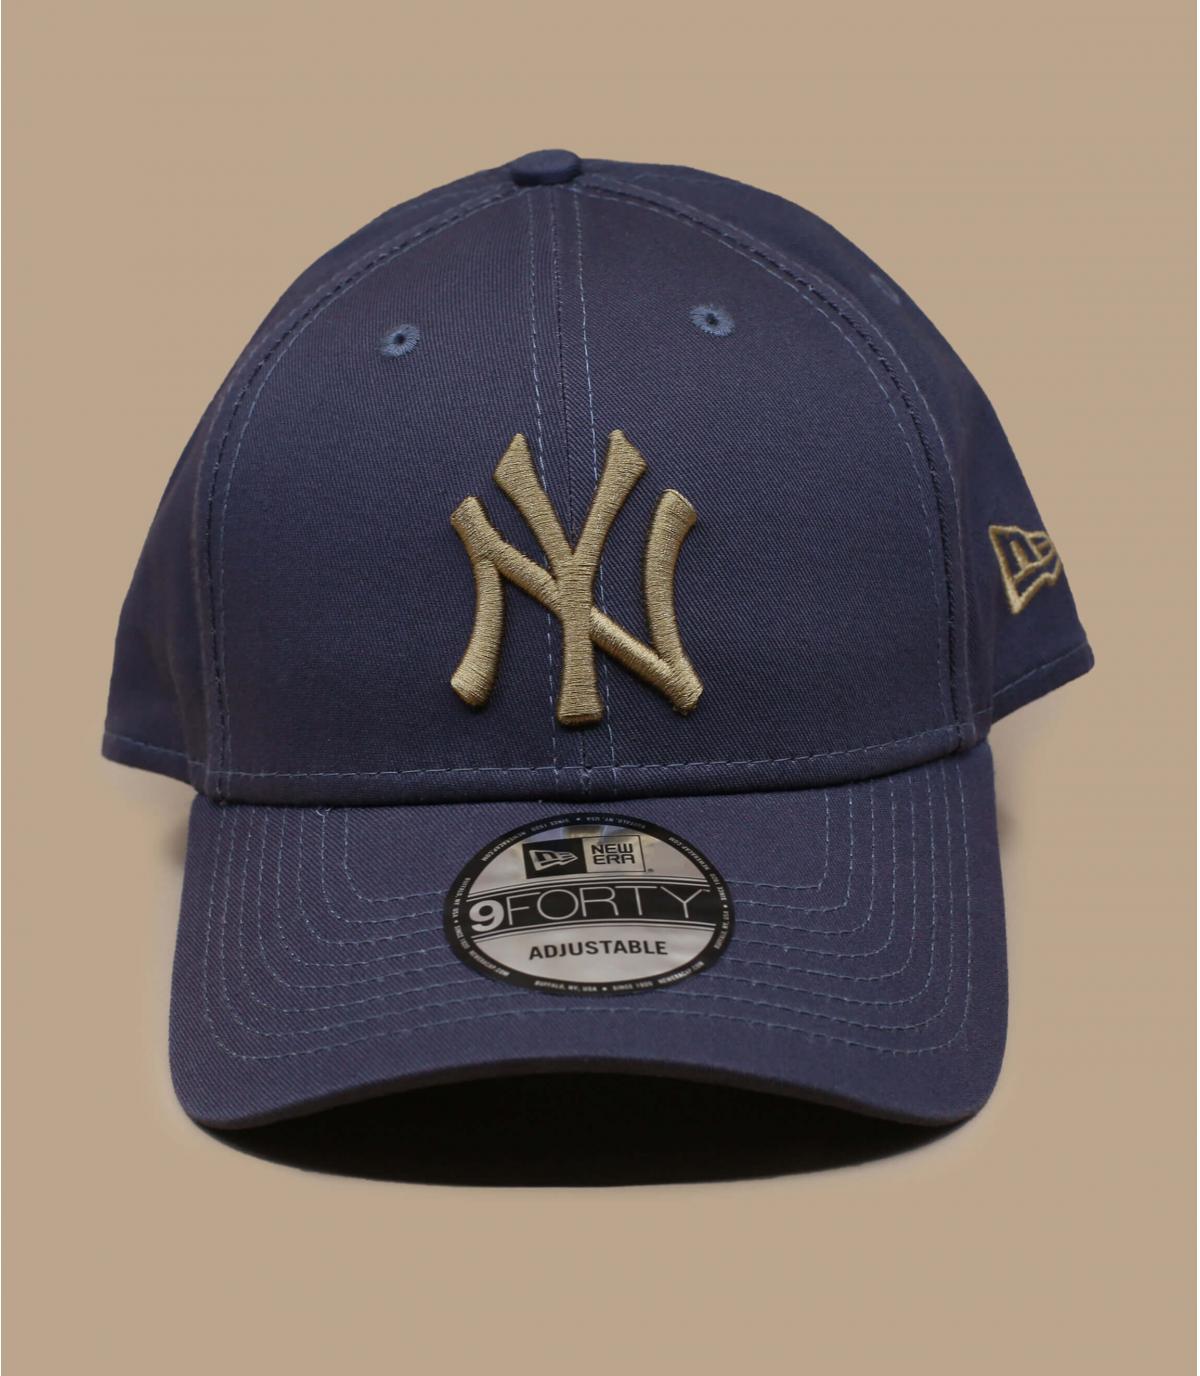 grey beige NY cap